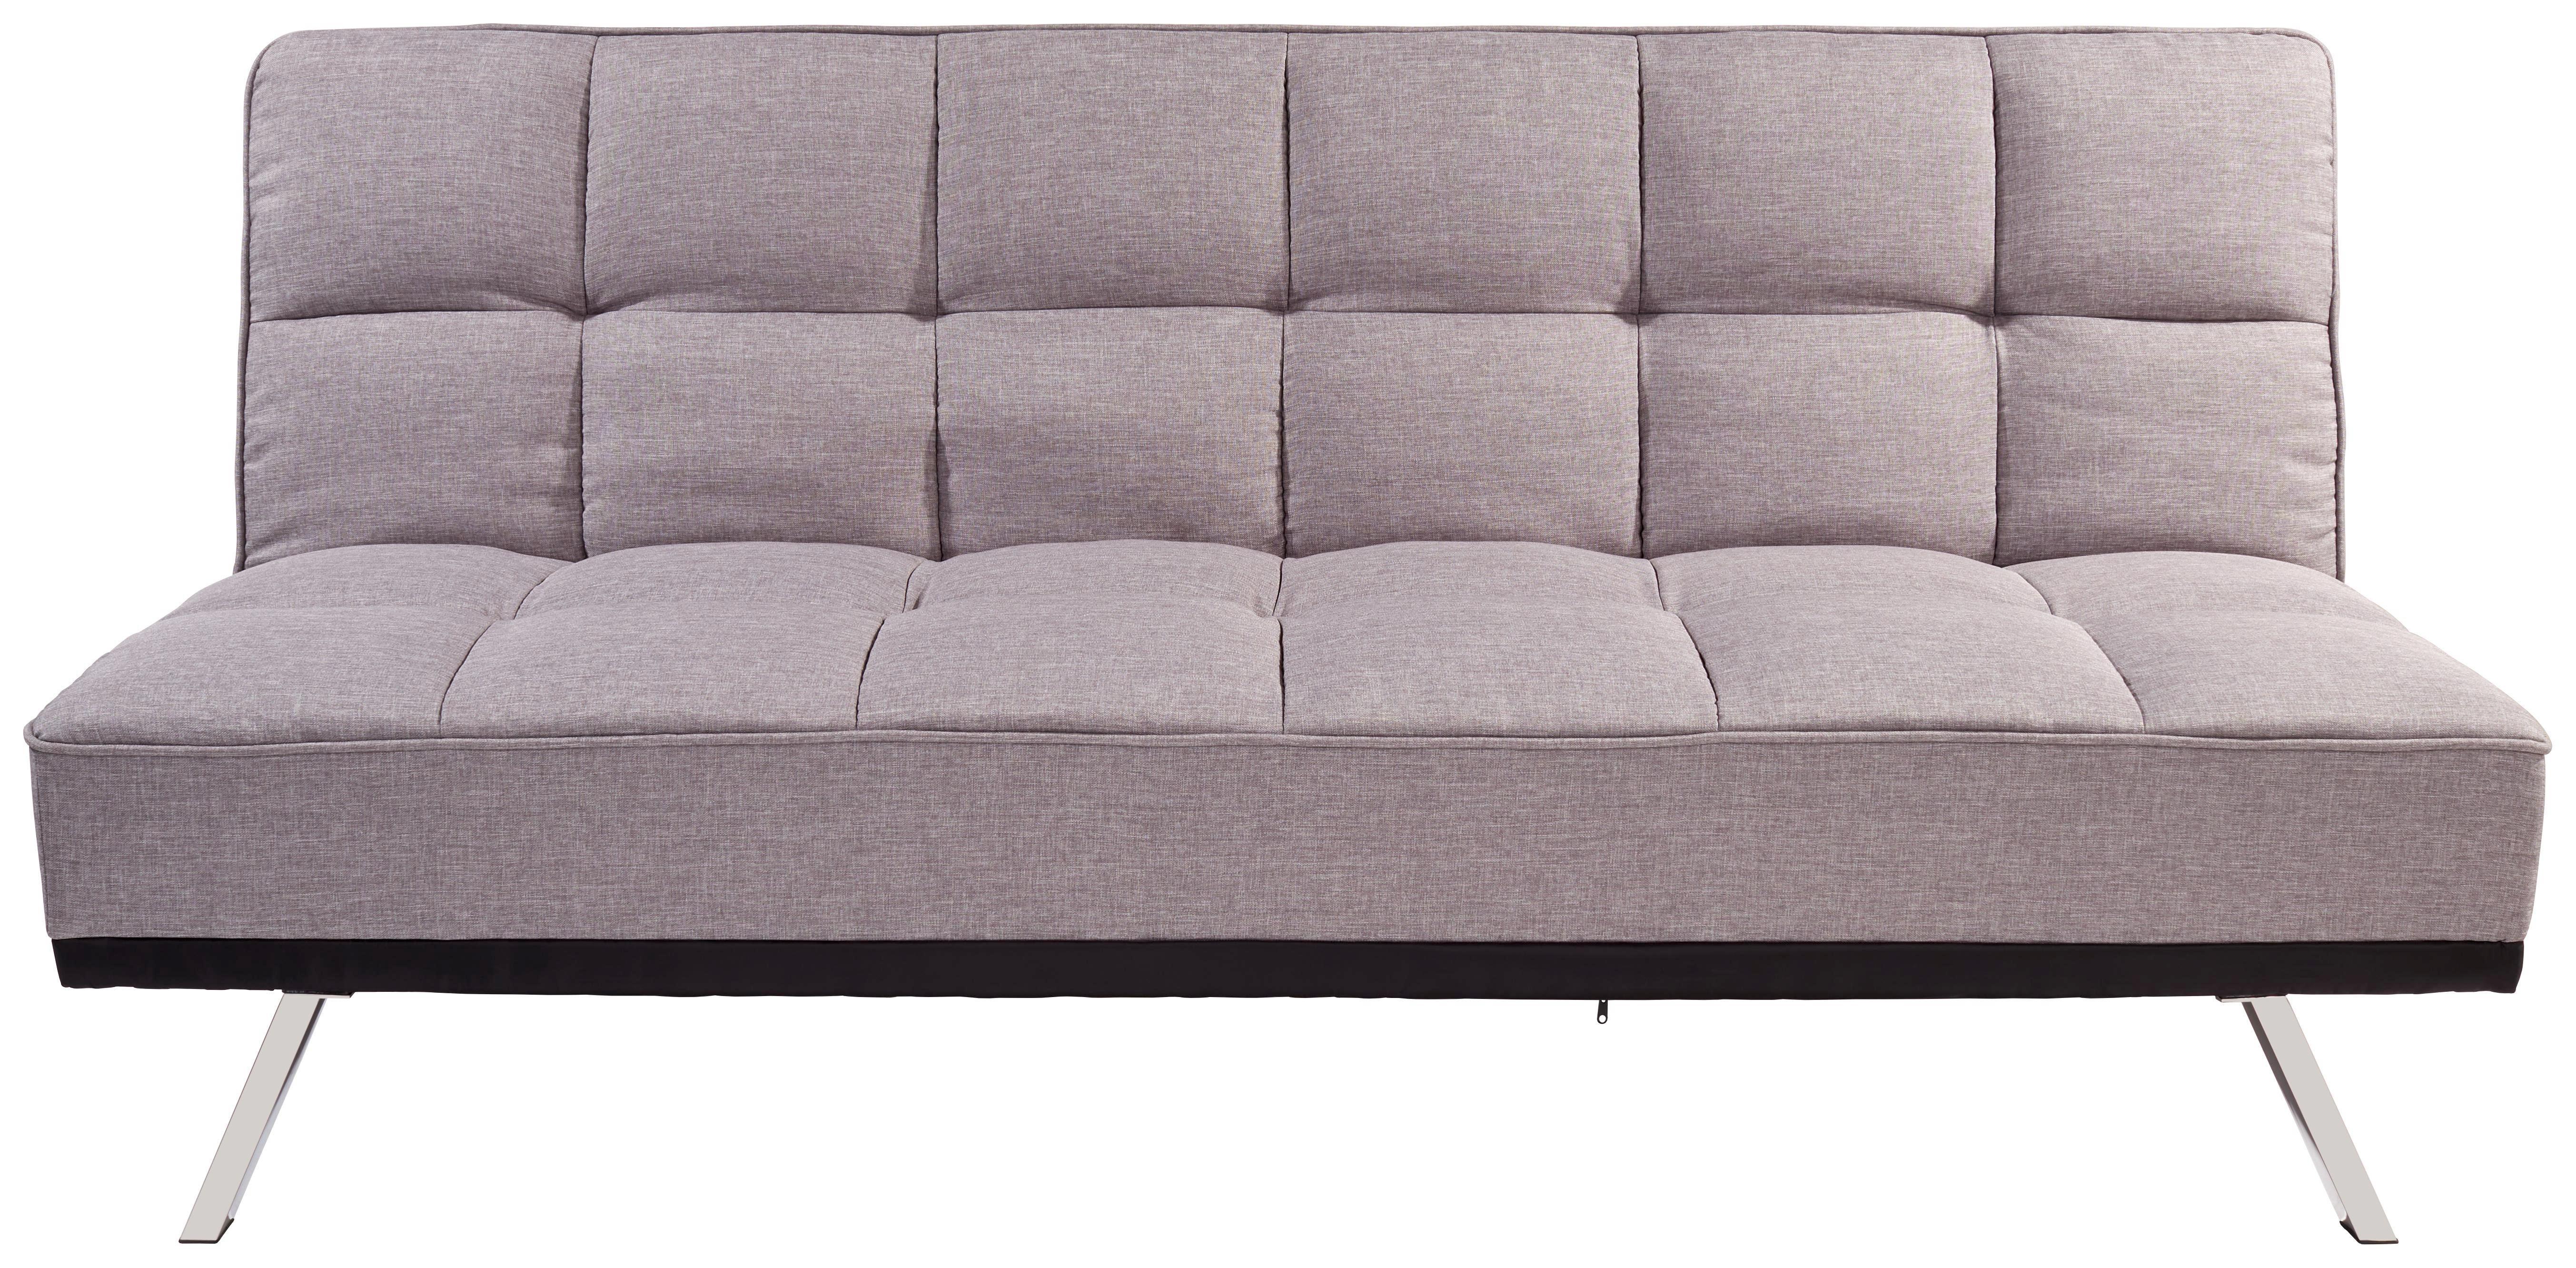 polsterbett mit bettkasten 90x200 best polsterbett. Black Bedroom Furniture Sets. Home Design Ideas